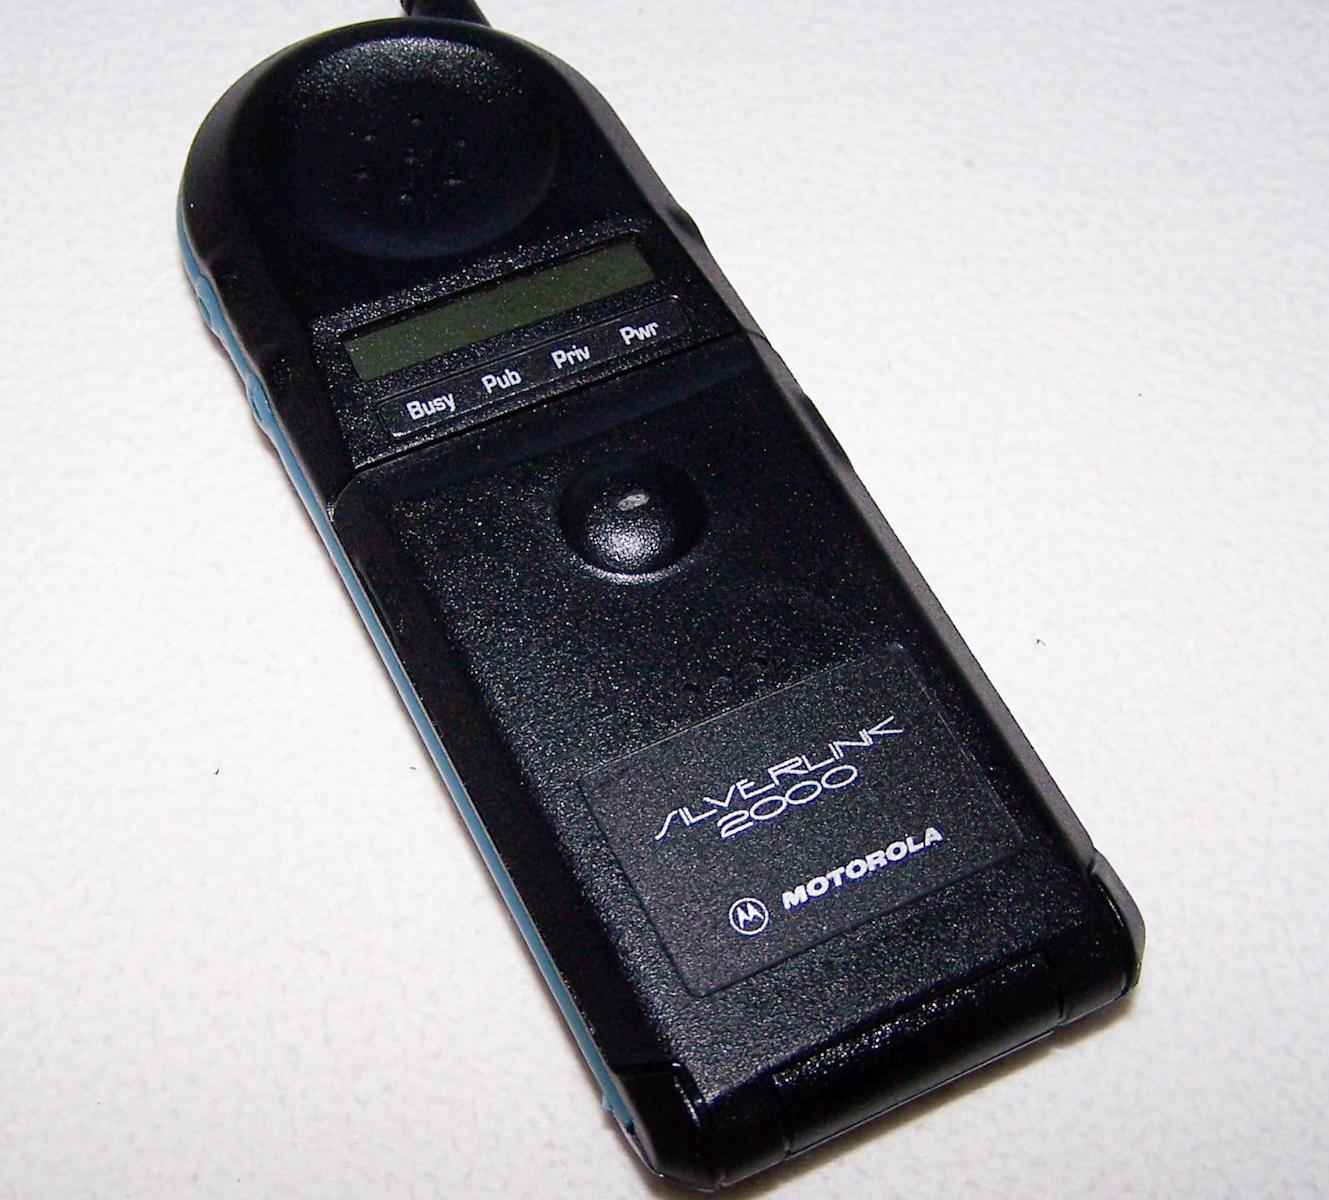 Büro - IT & Kommunikation - CT2-Schnurlos-Telefon Motorola Silverlink 2000